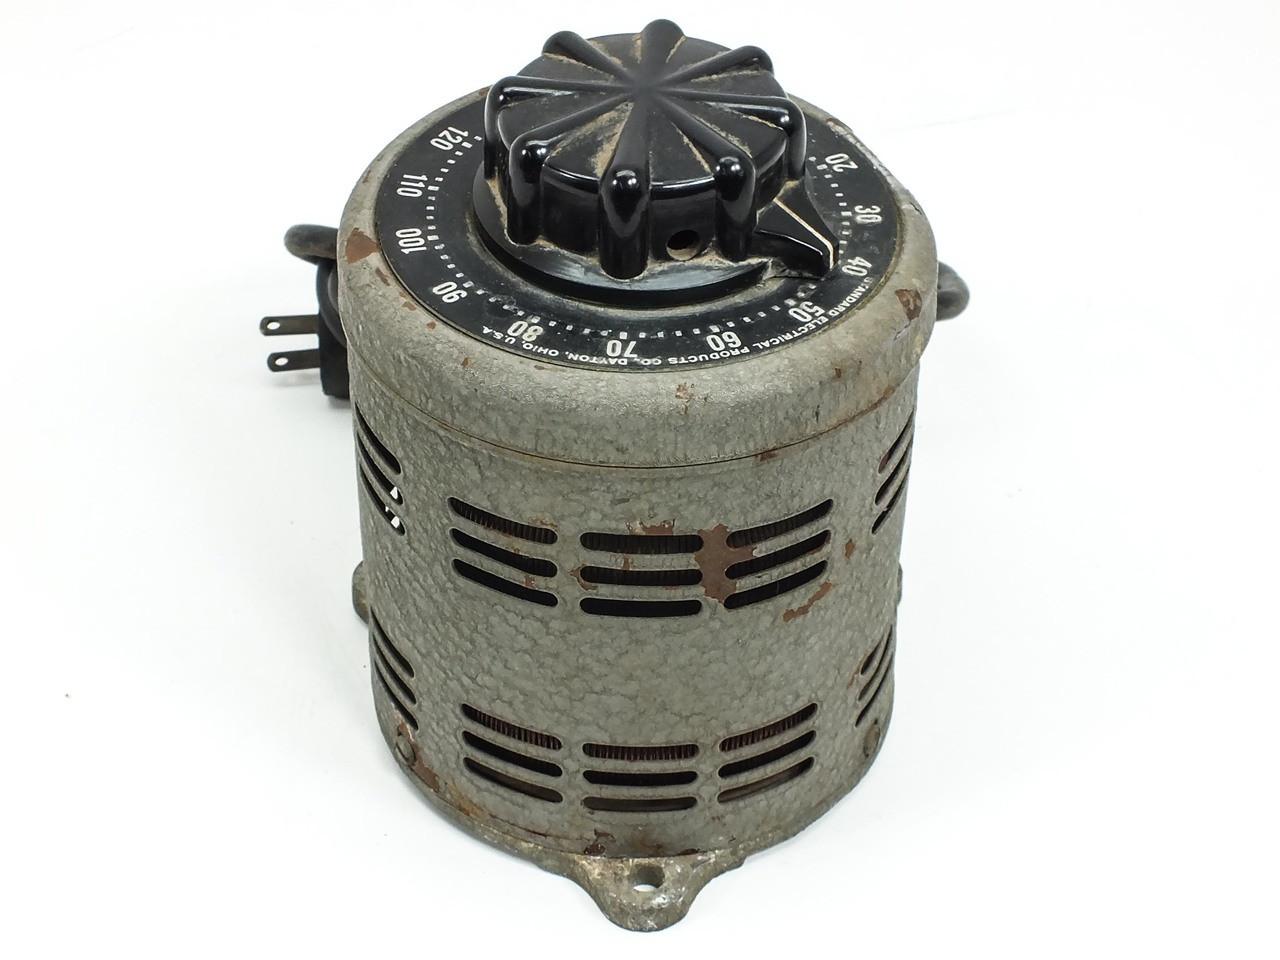 STACO 500B Adjust-A-Volt 140VAC 7 5A Power Supply